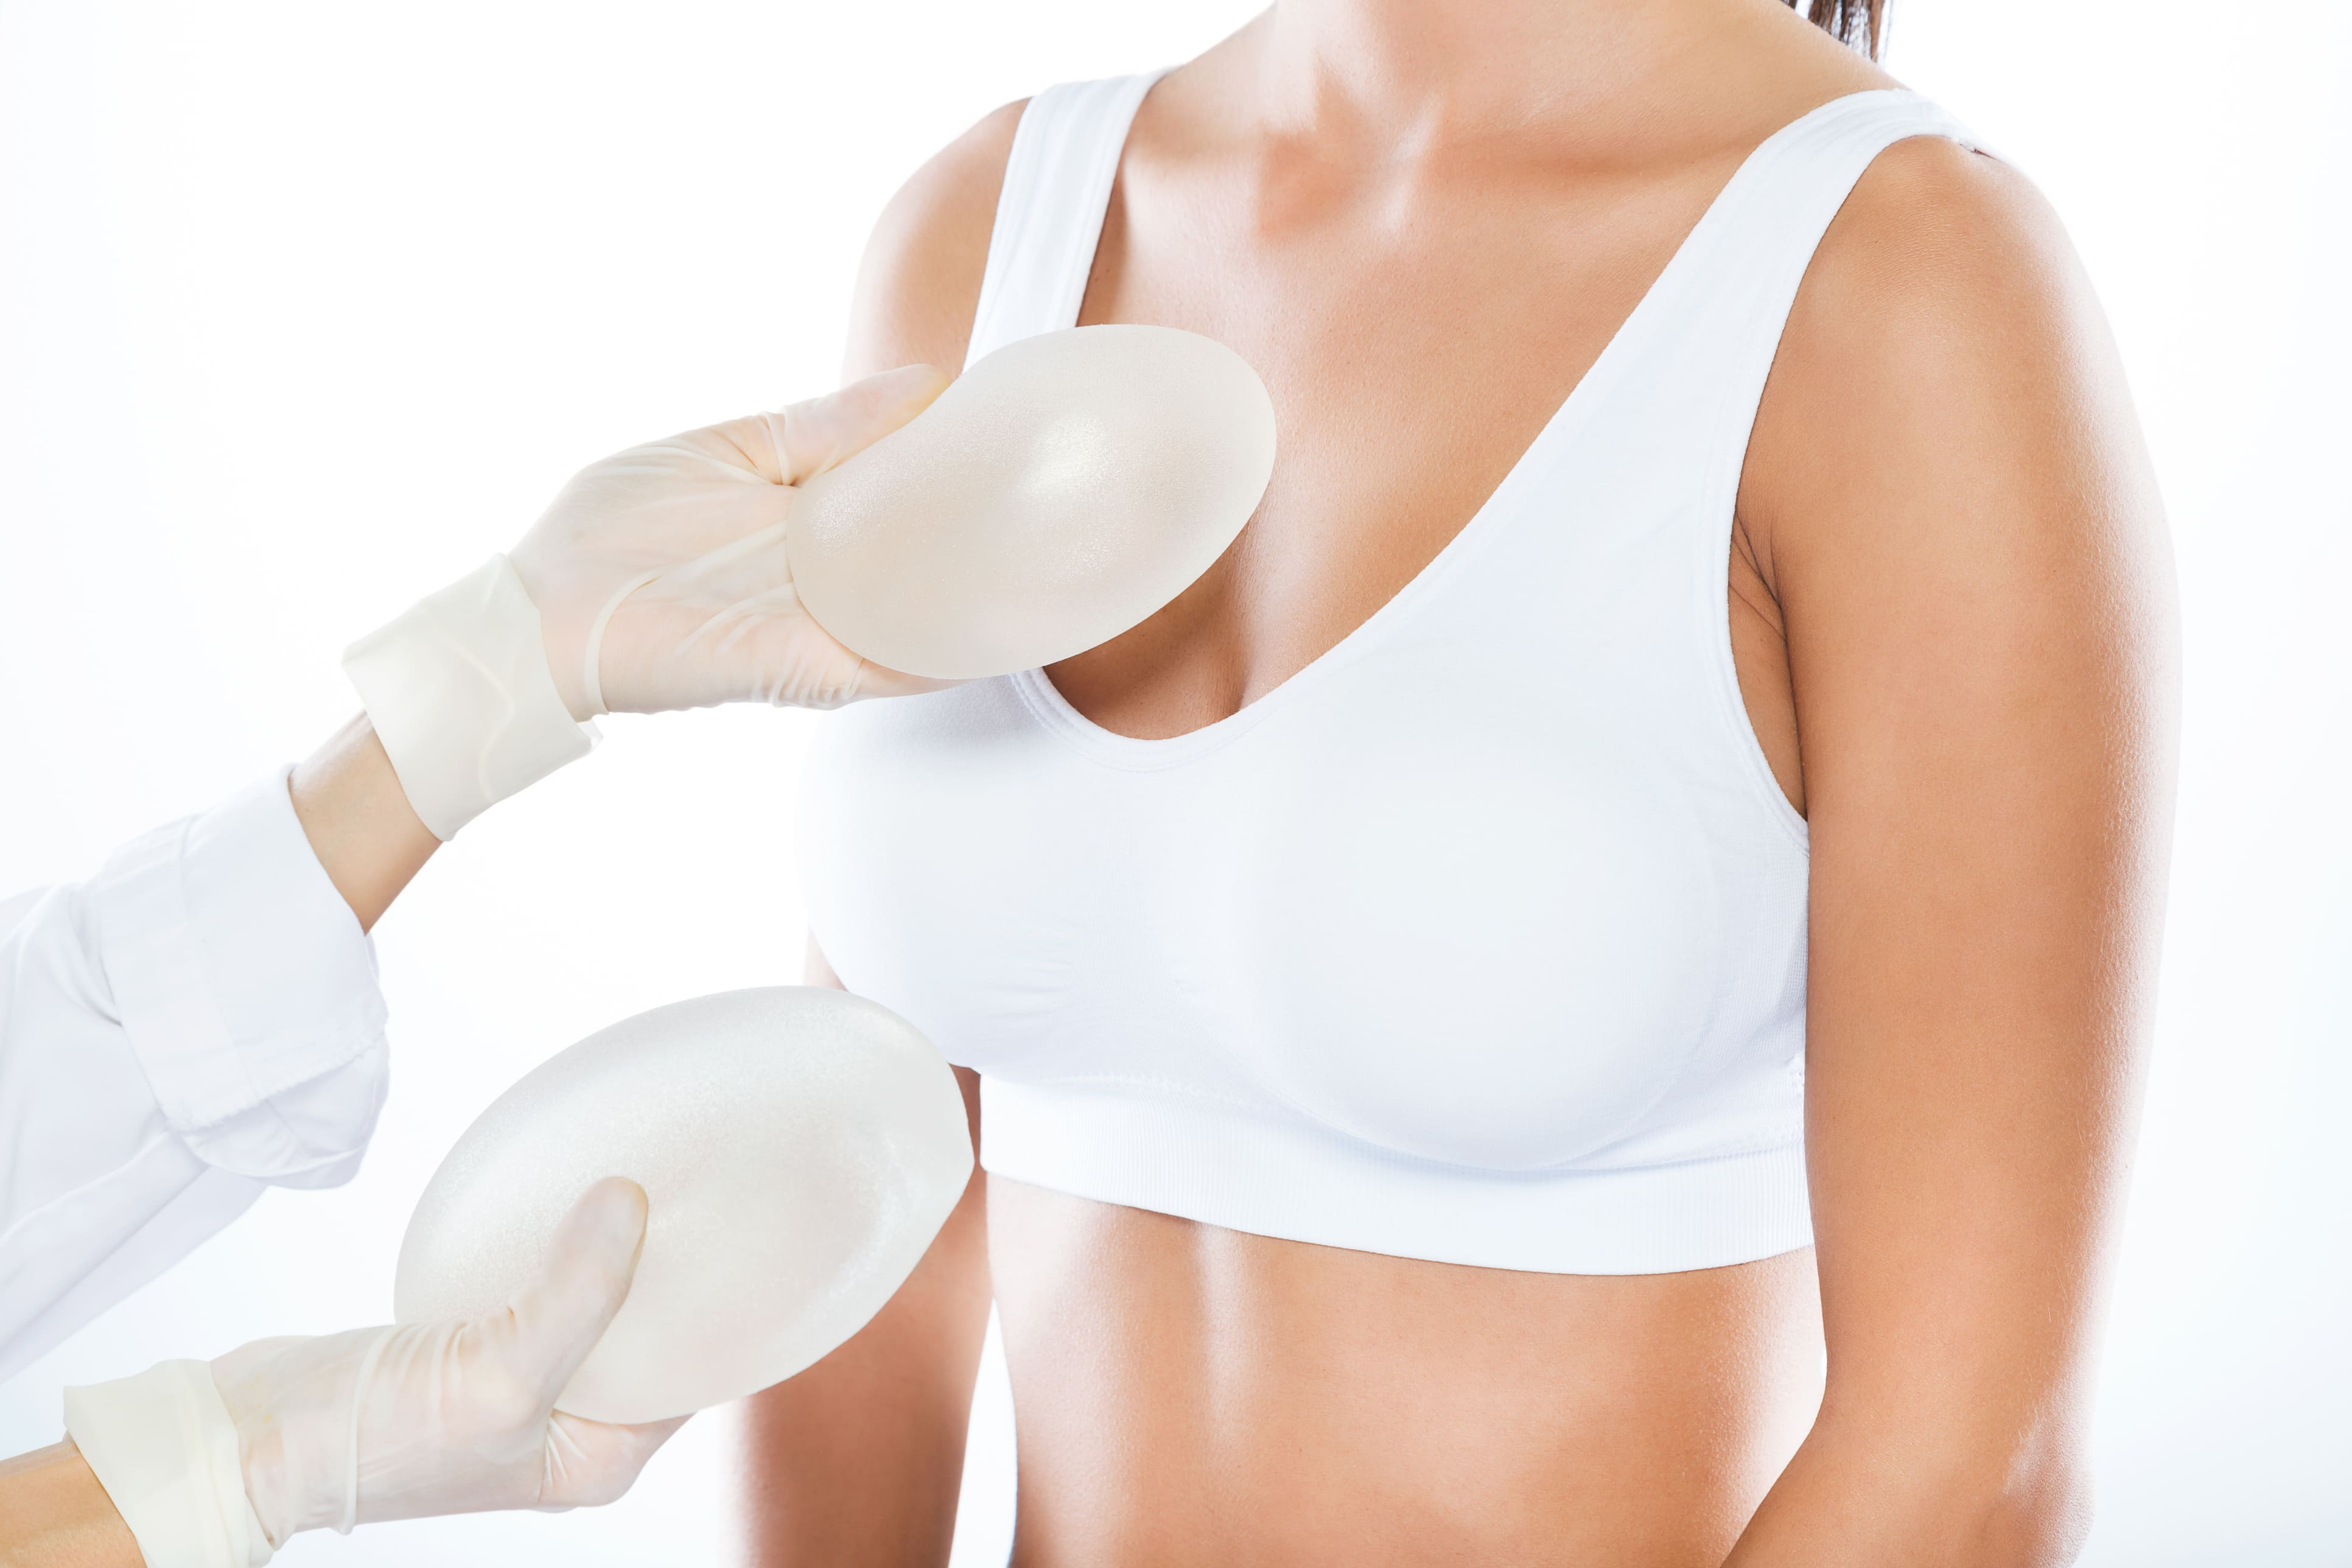 Best Breast Augmentation Clinic in Thousand Oaks